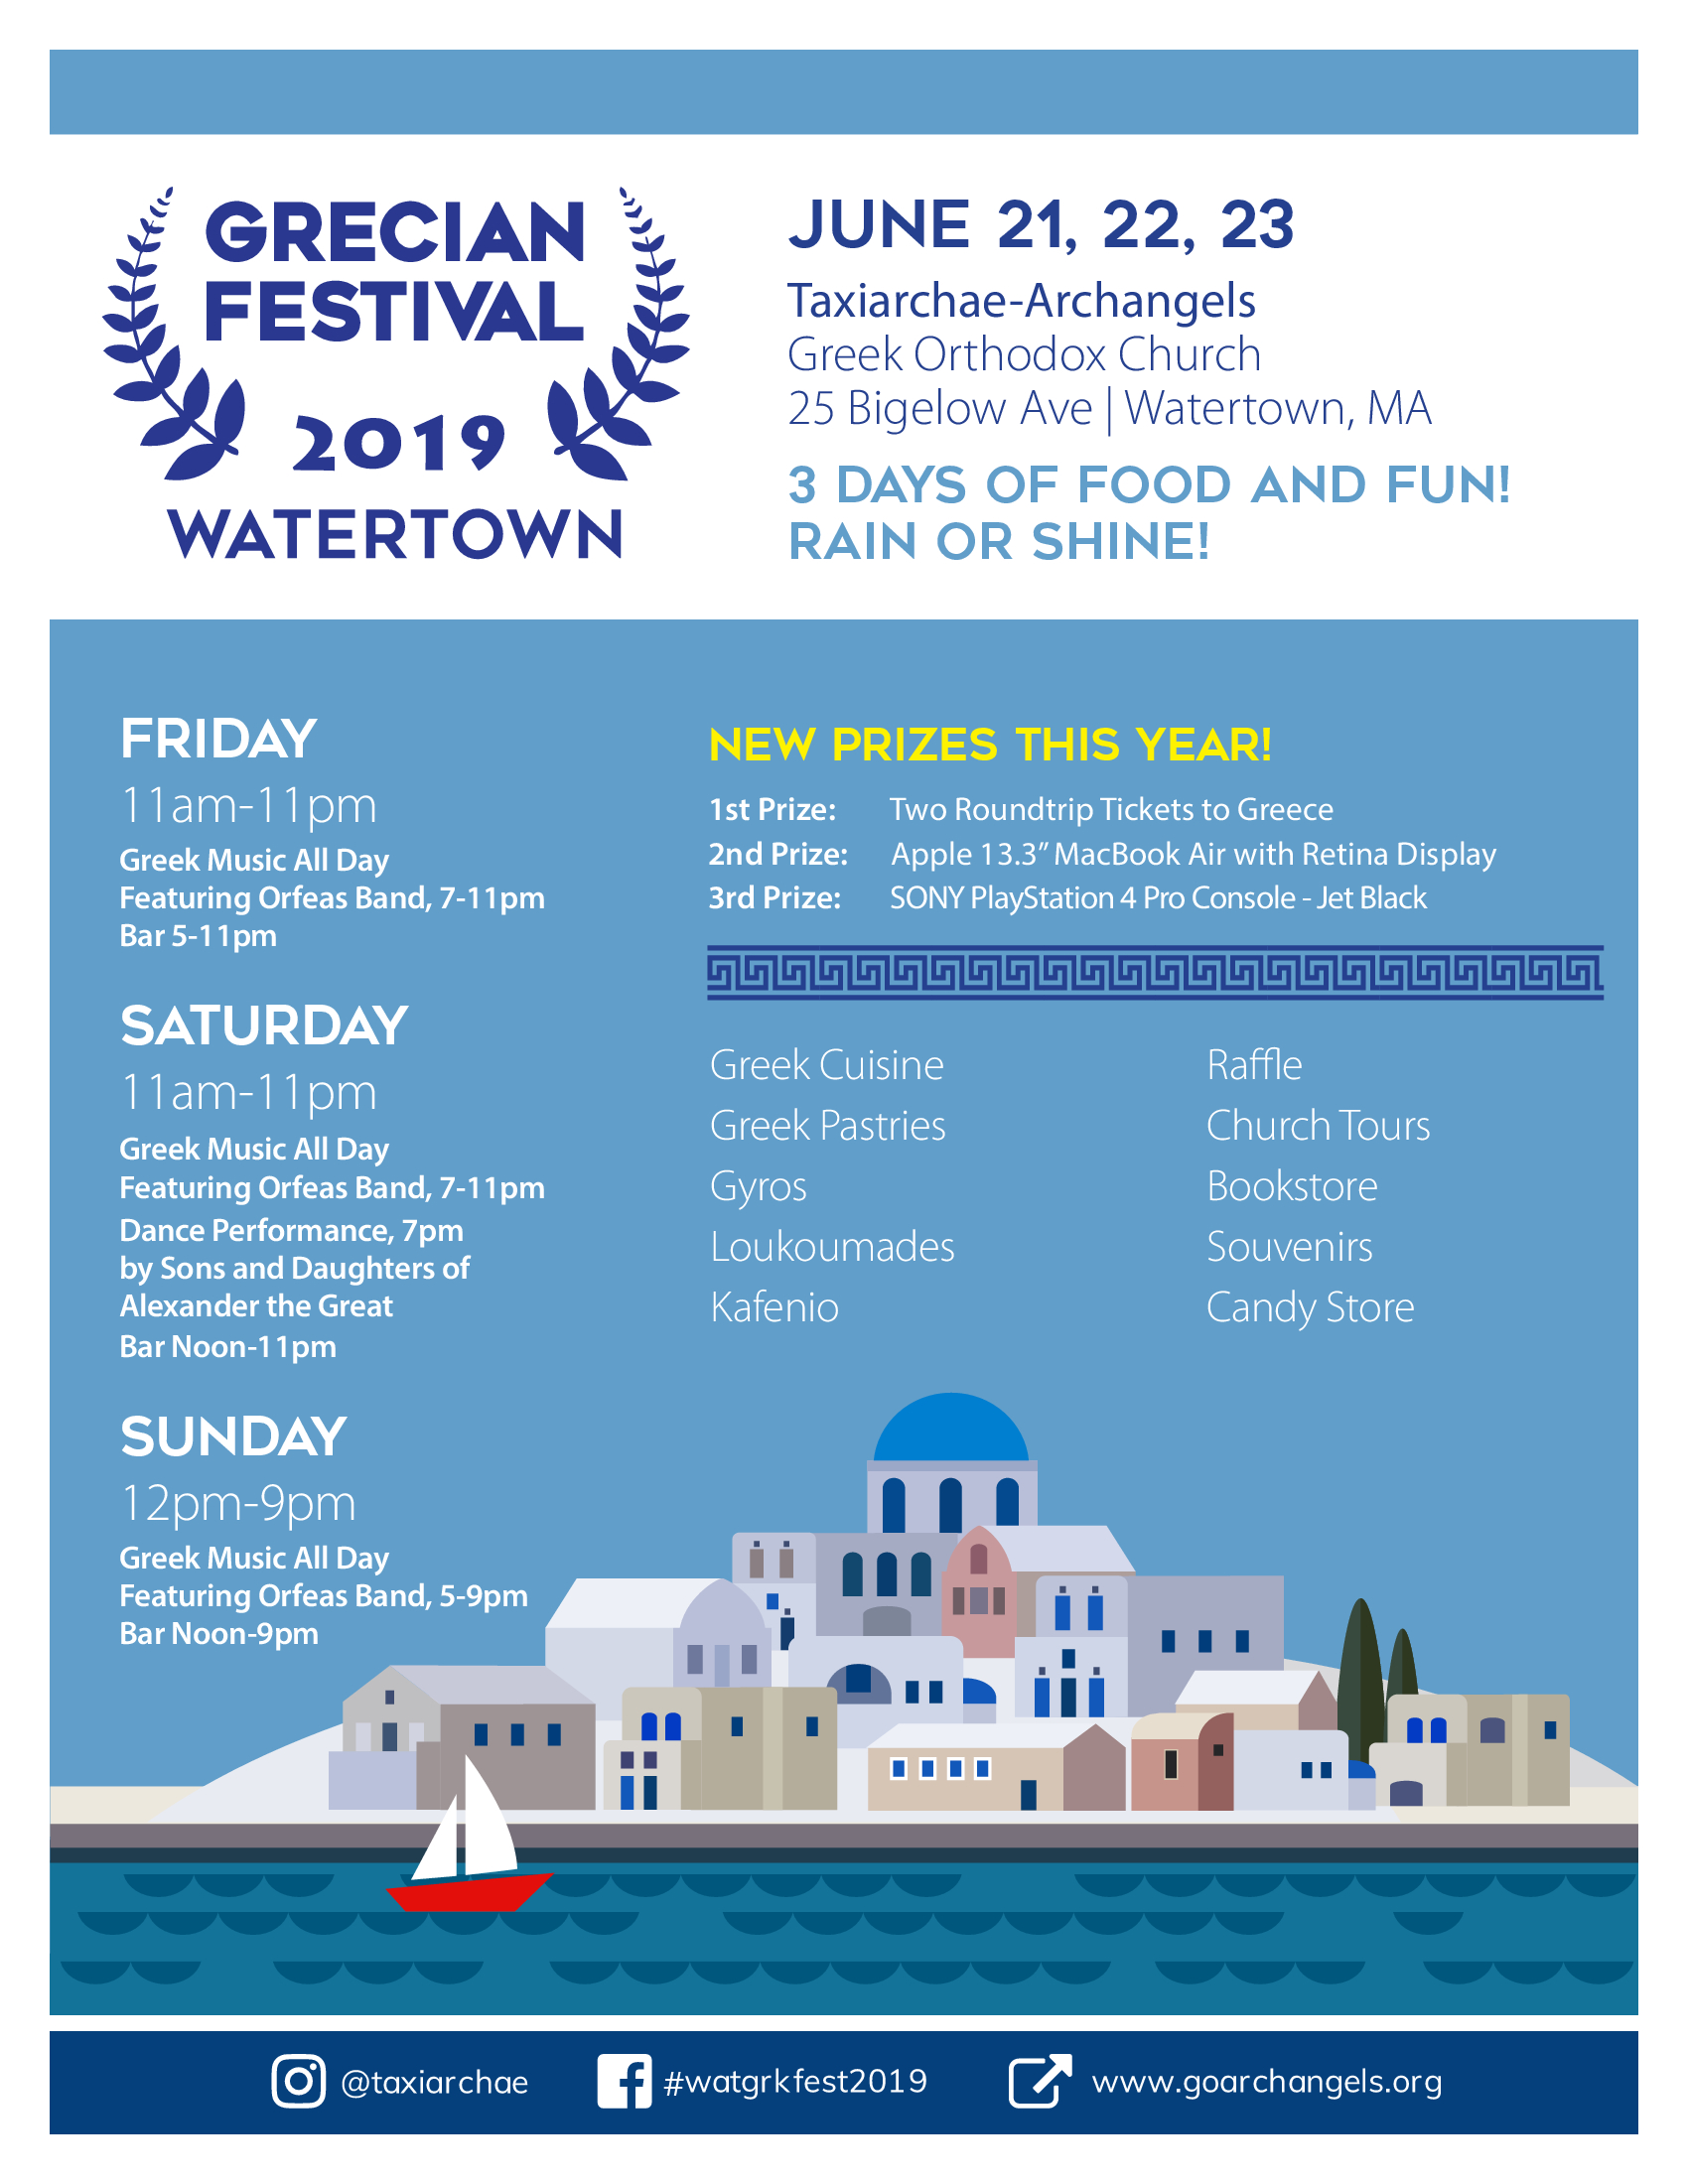 Watertown MA Greek Festival at Taxiarchae/Archangels Greek Orthodox